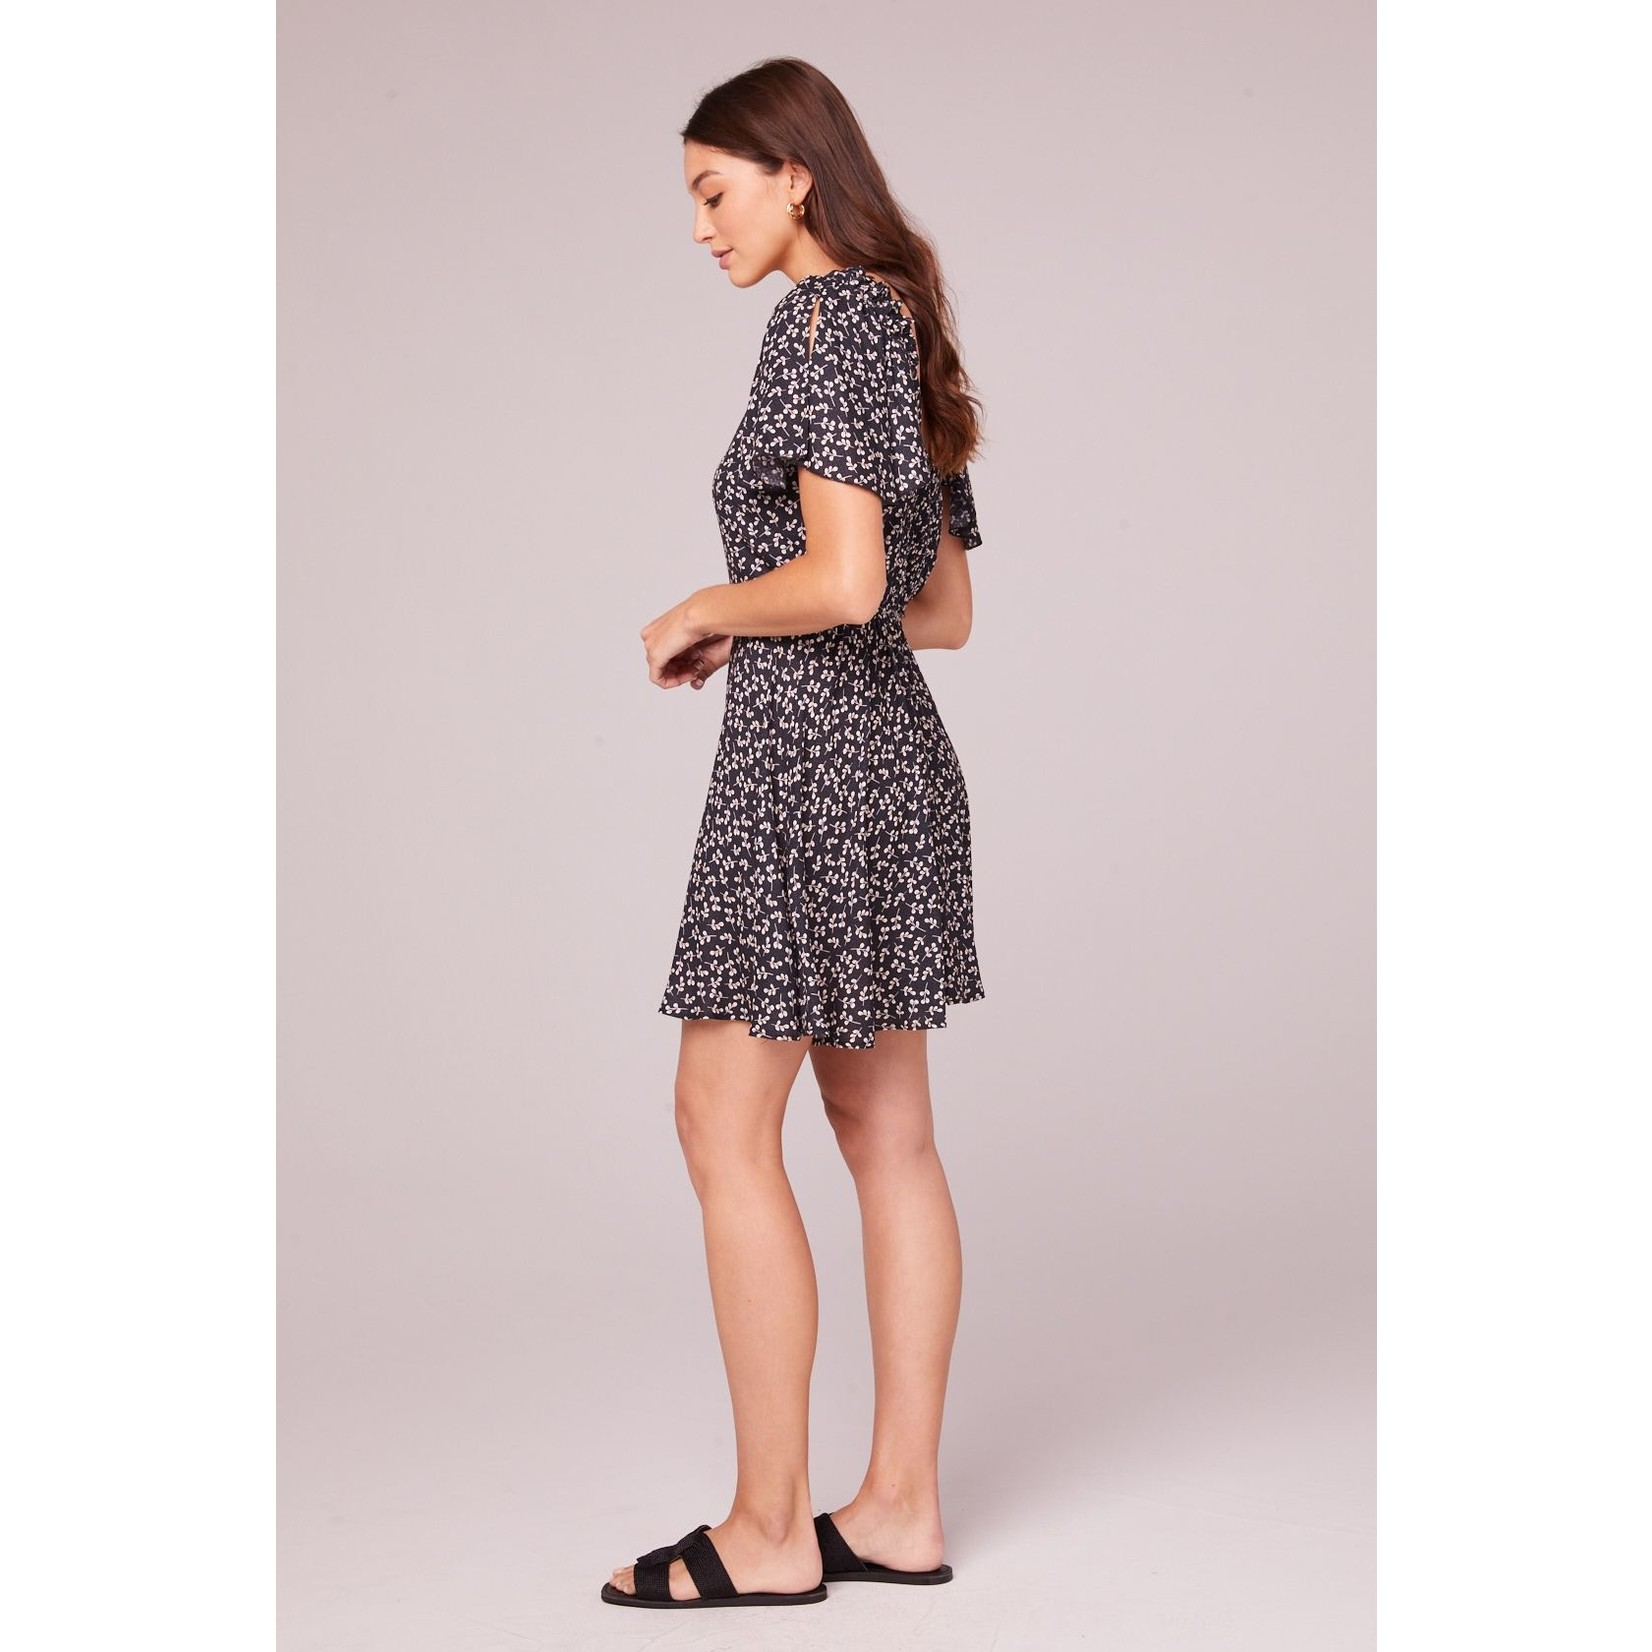 B.O.G. Collective Odette Dress